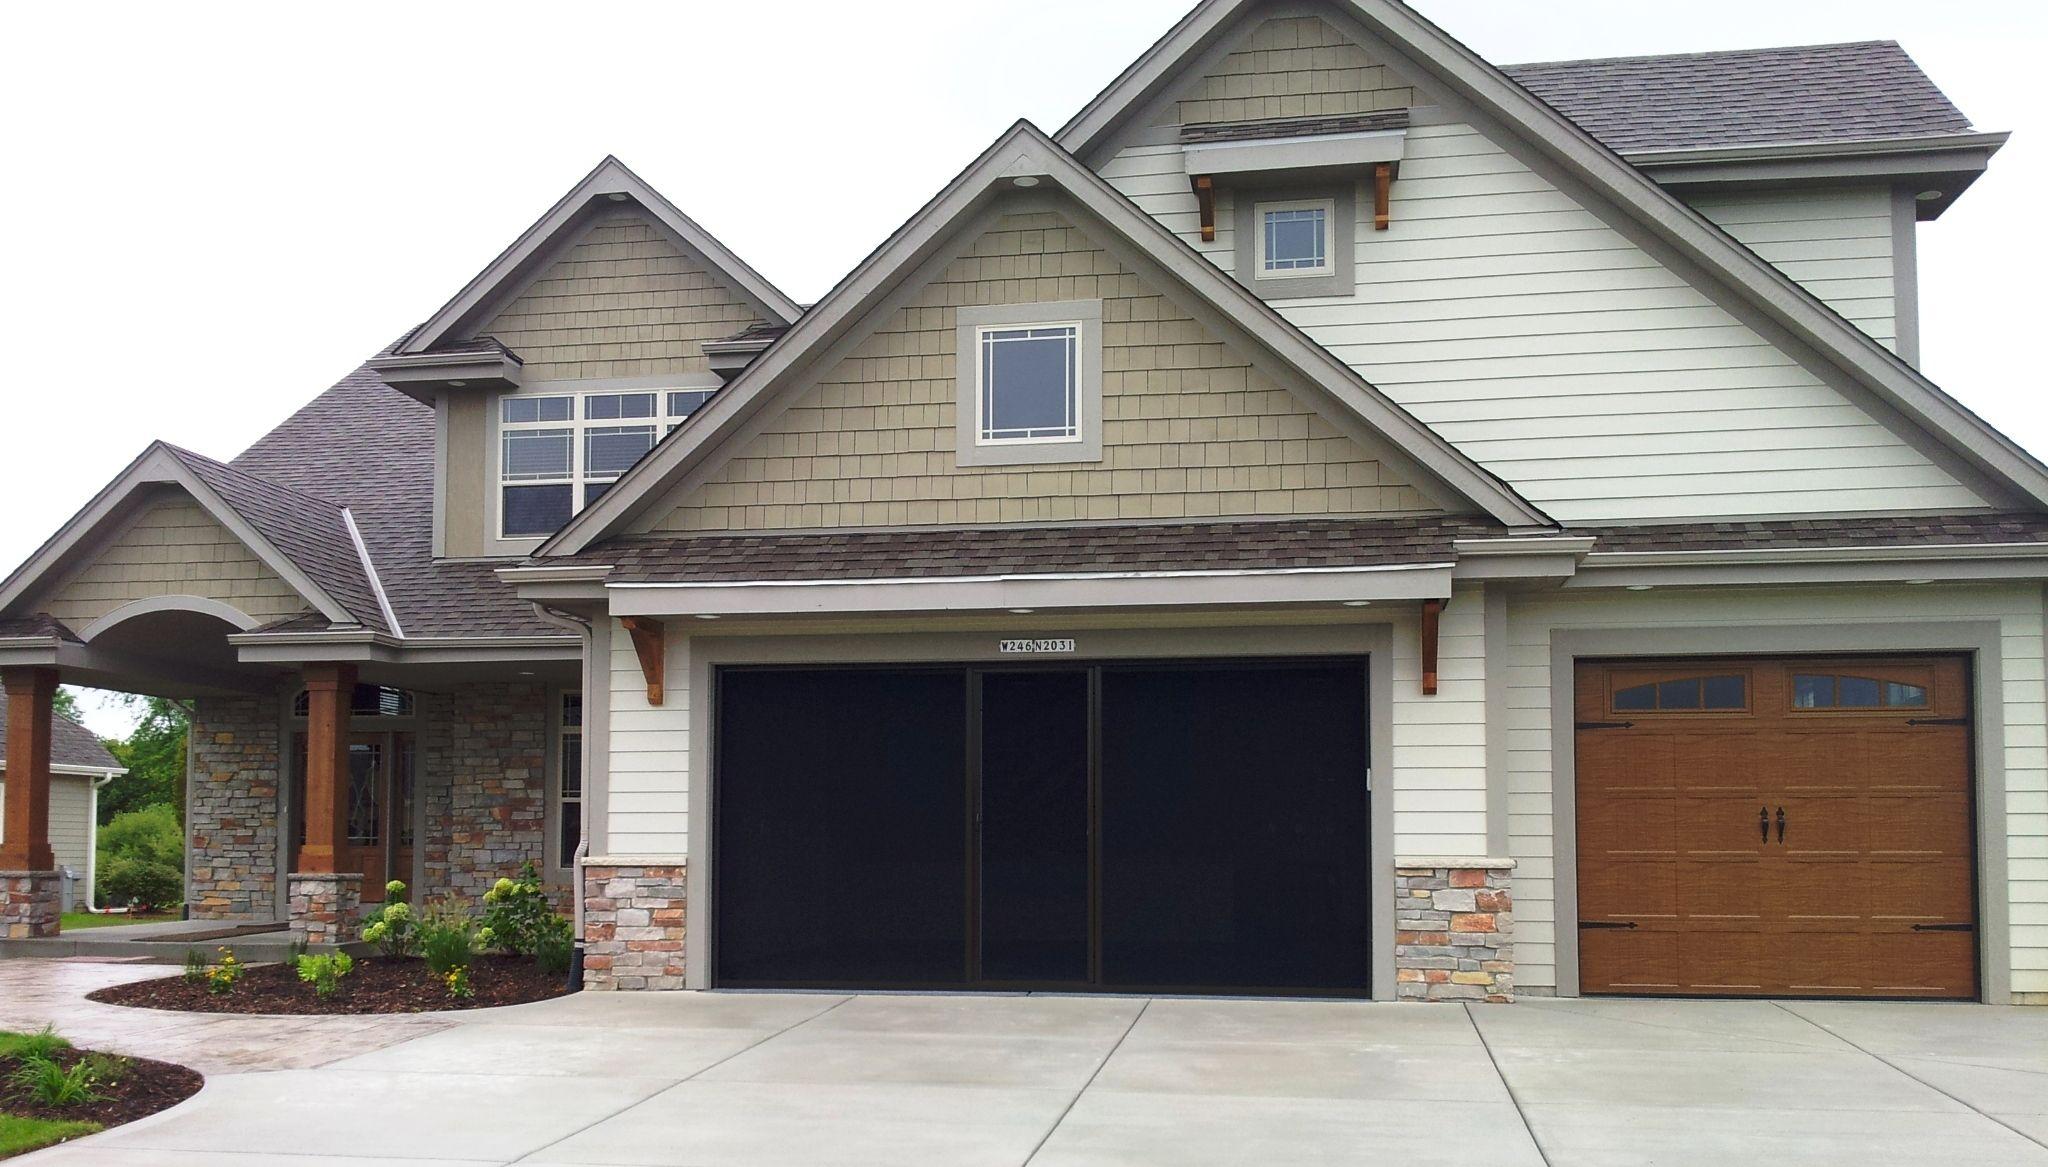 Karek Homes Http Www Joewilde Com Products Garage Screen Flooring Php Retractable Screen Garage Addition Home